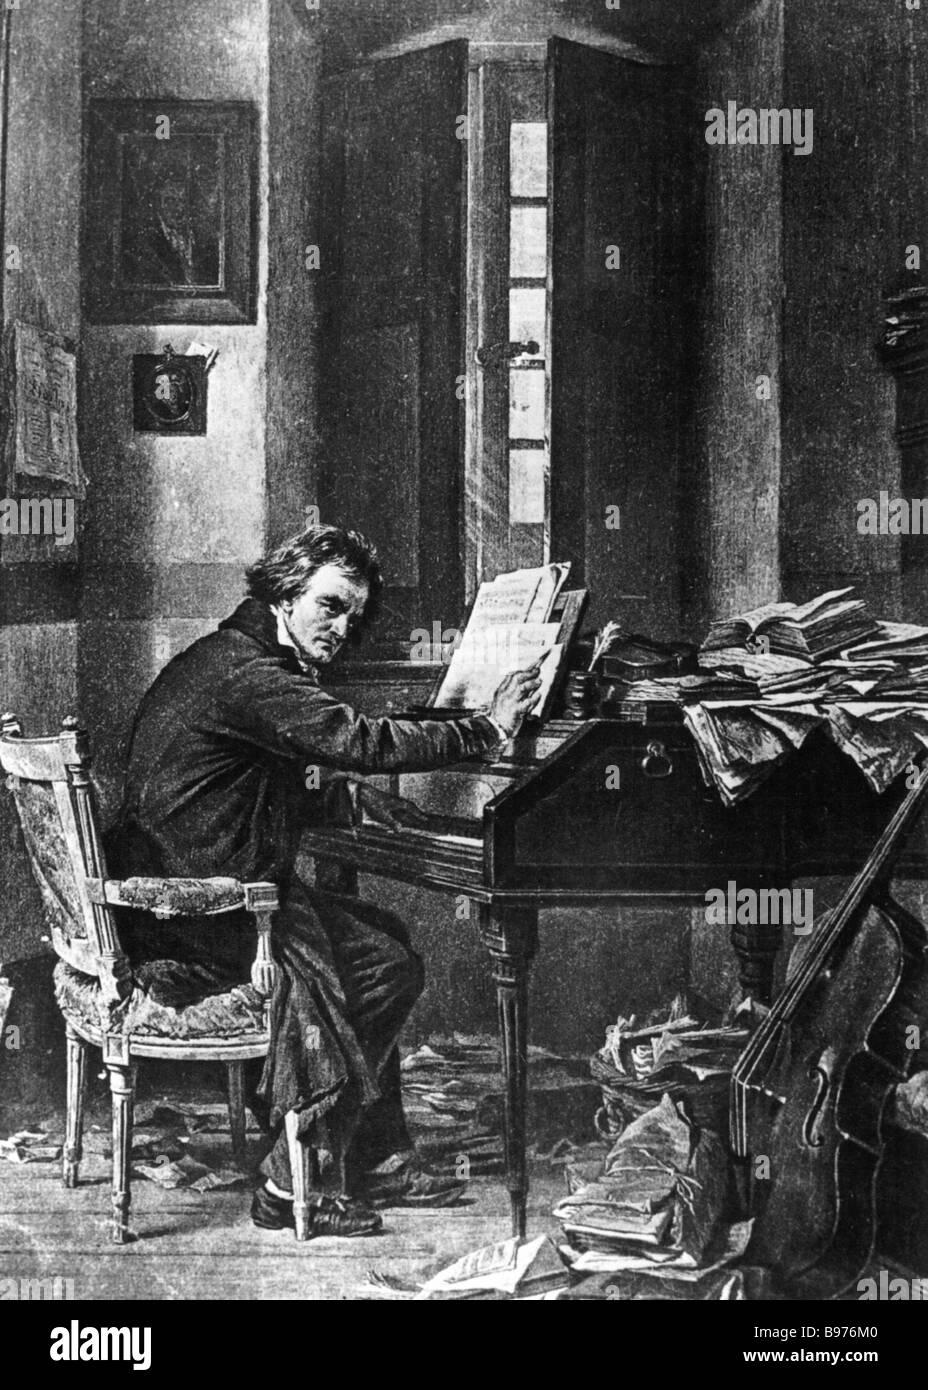 LUDWIG VAN BEETHOVEN German composer 1770 to 1827 - Stock Image